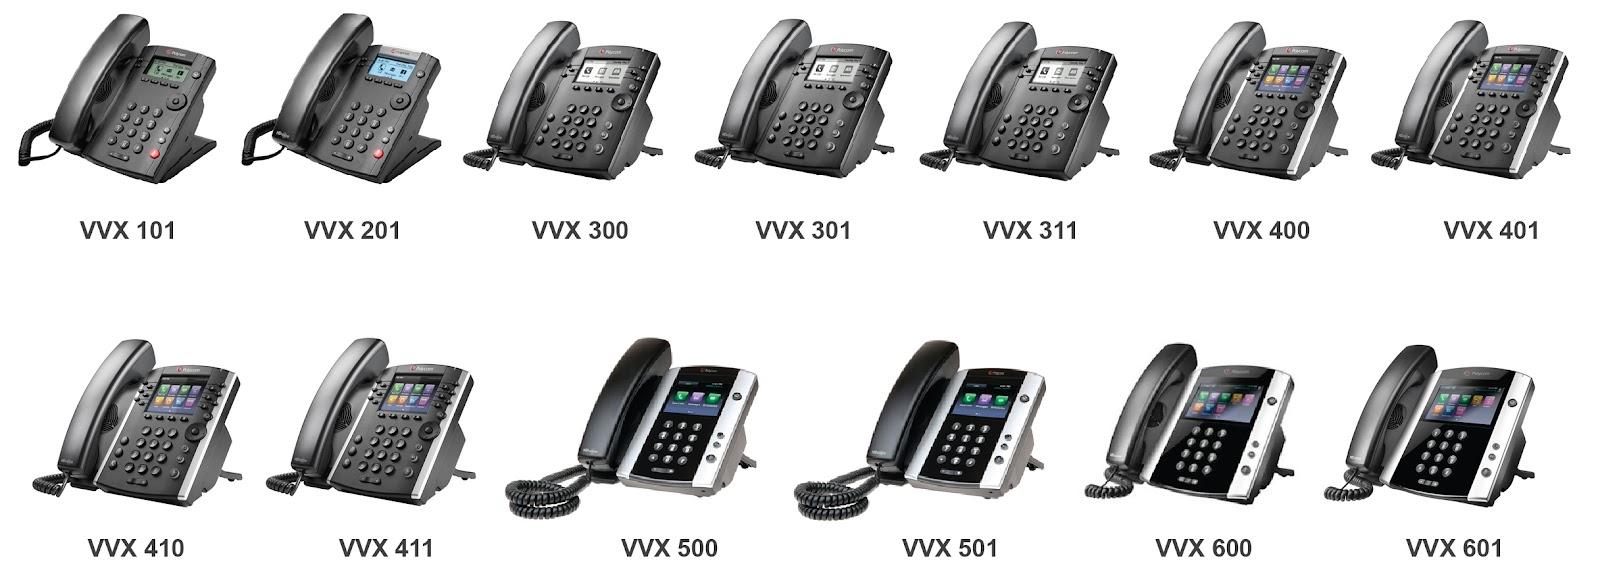 Set Up VVX Series for 3CX